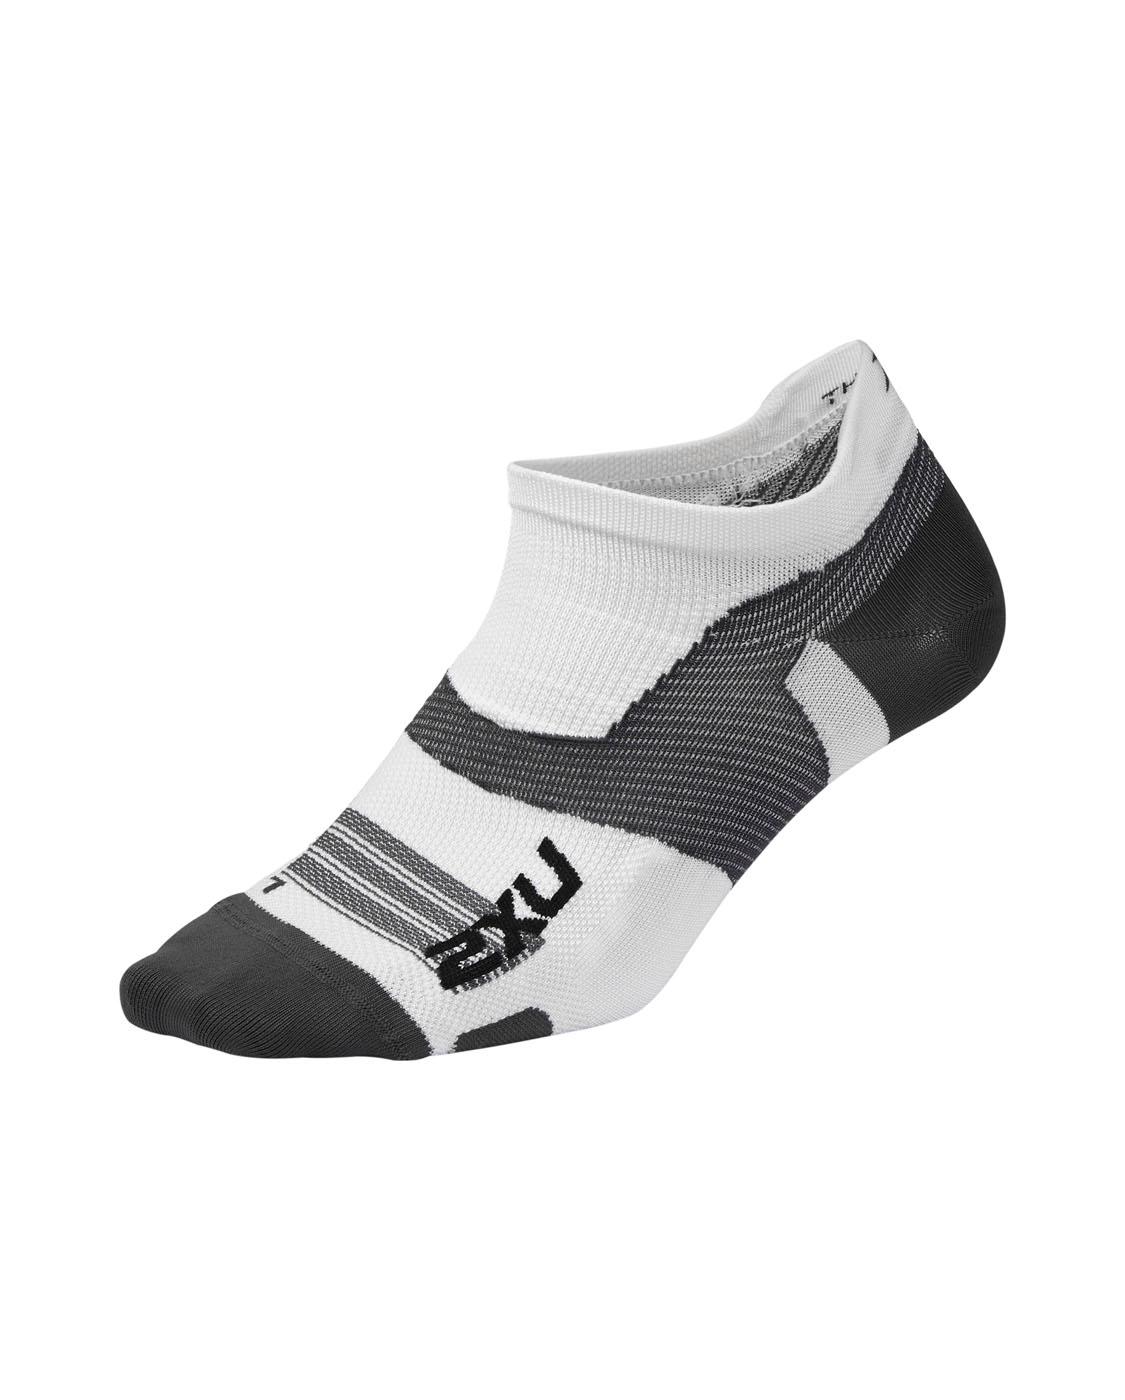 2XU Unisex Vectr Ultralight No Show Socks - White/Grey